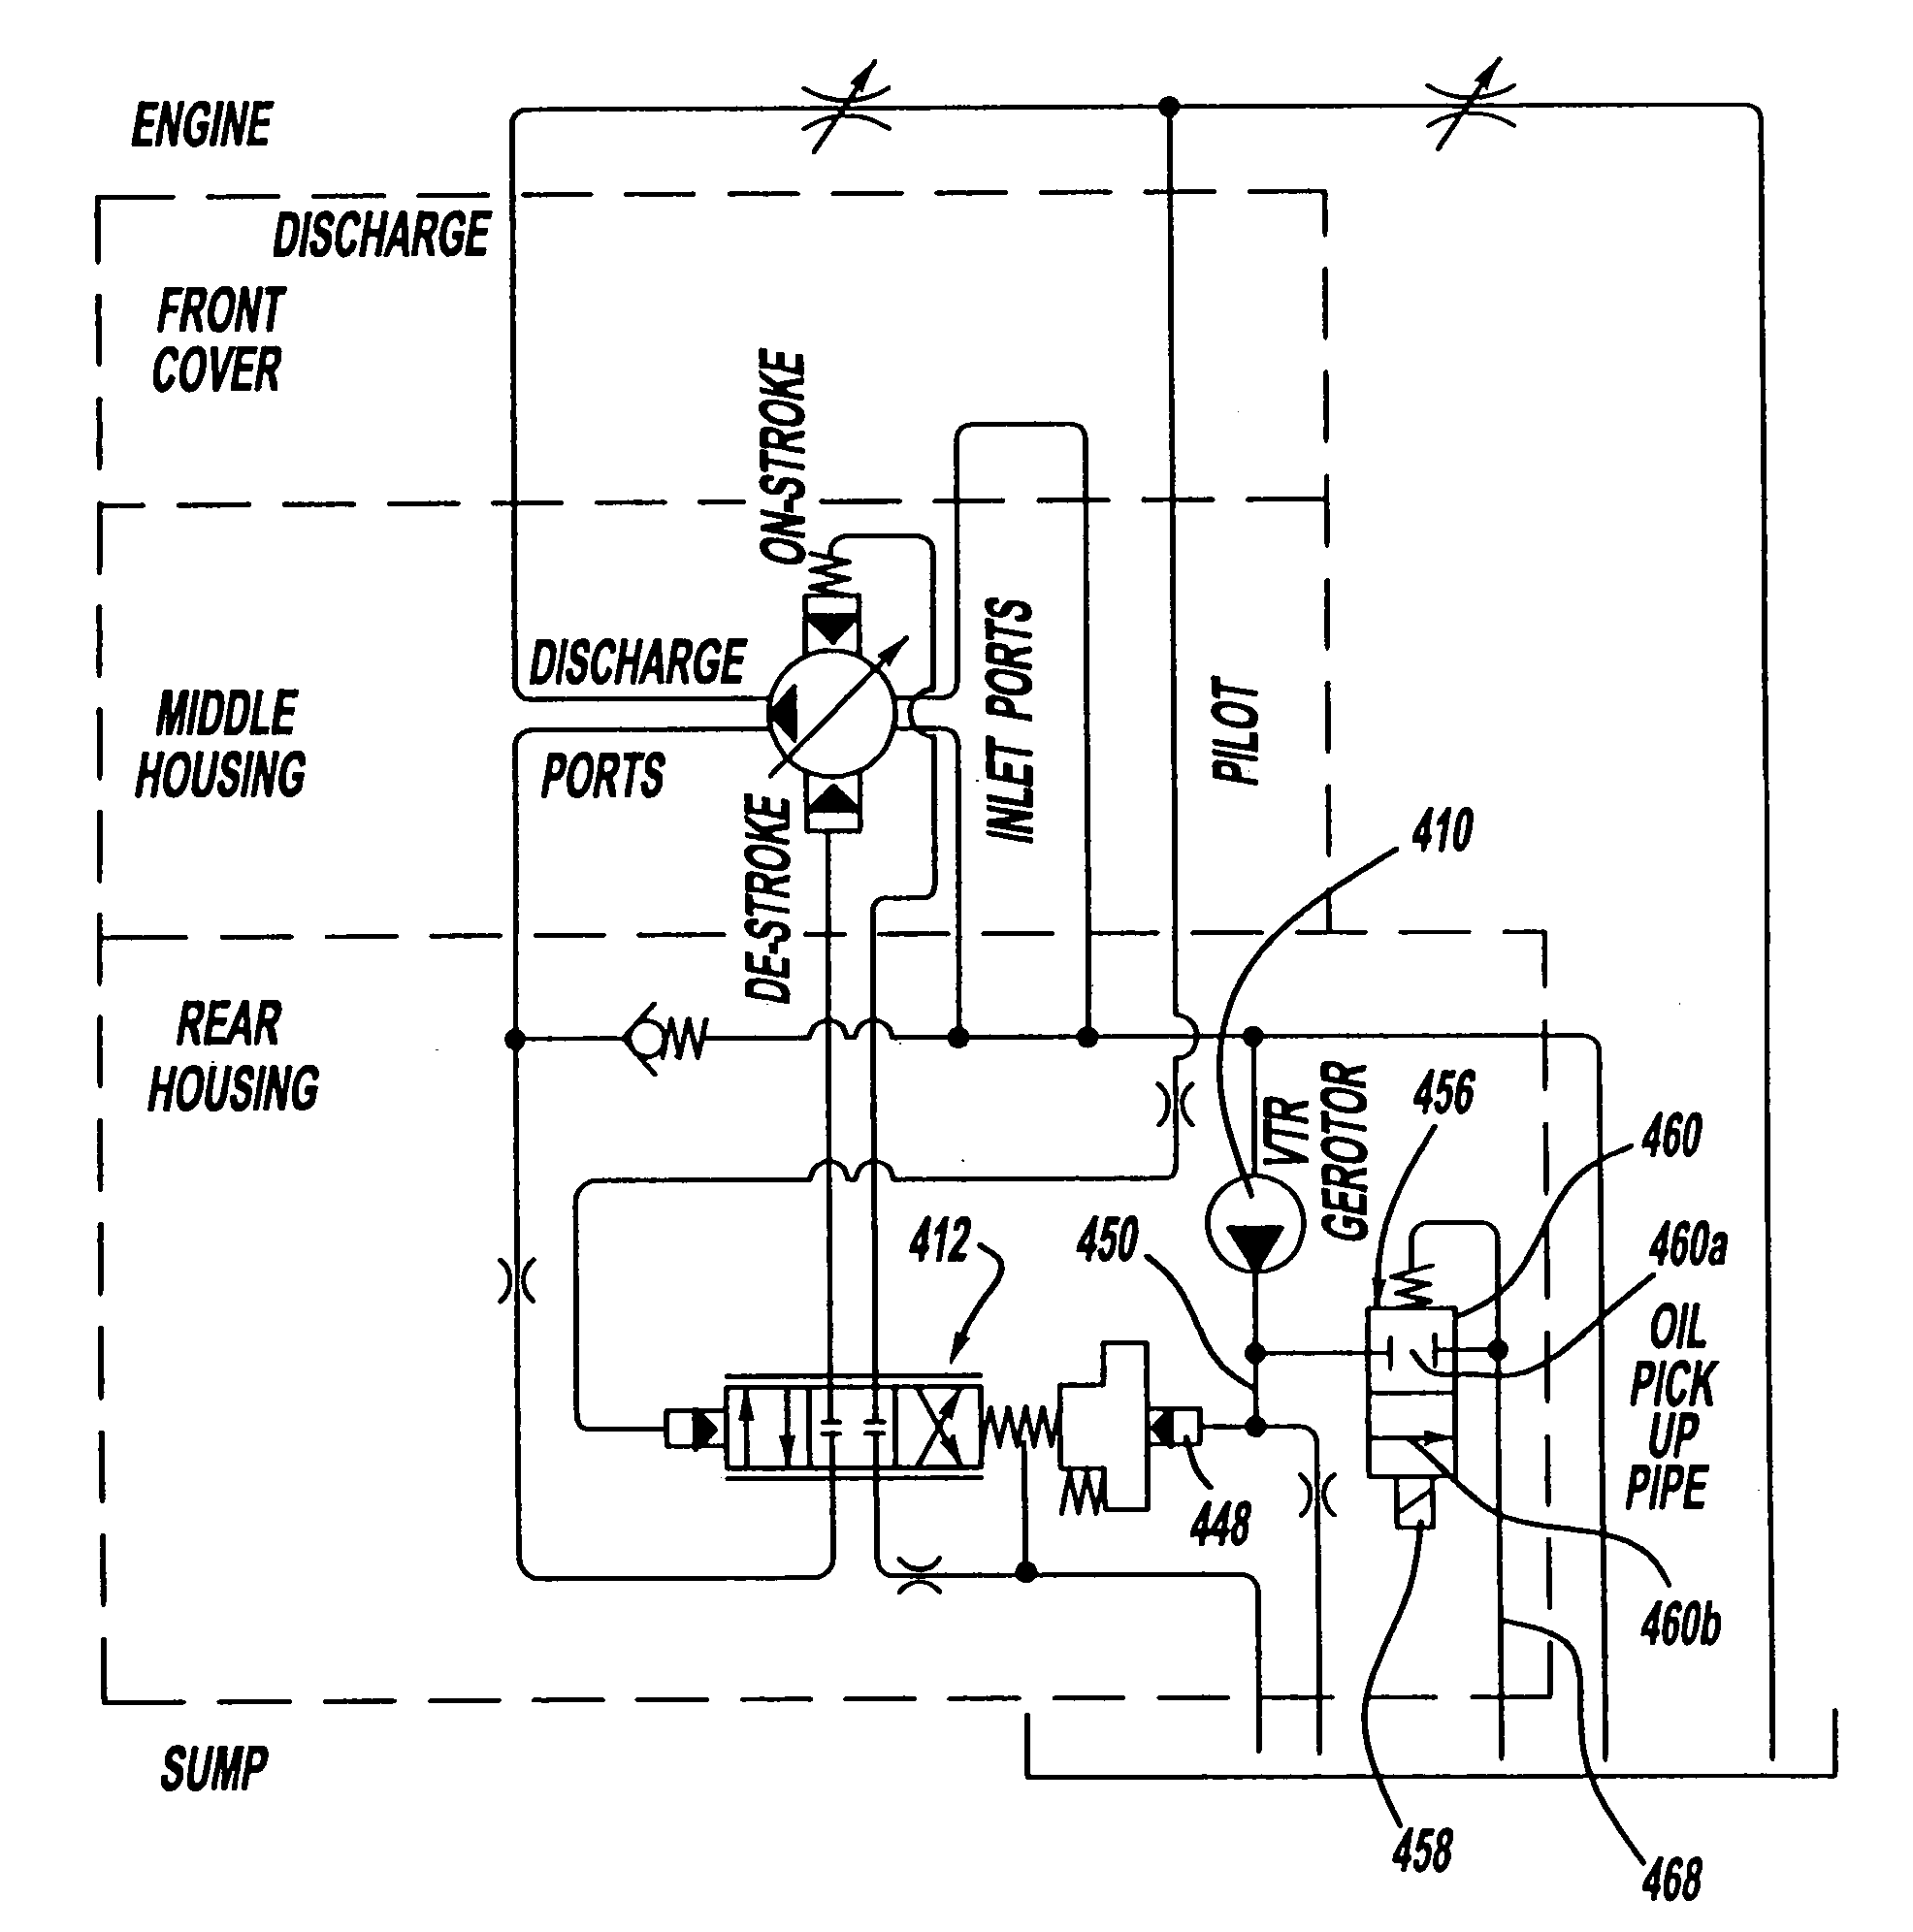 Engine Lubrication System Oil Pressure, Engine, Free